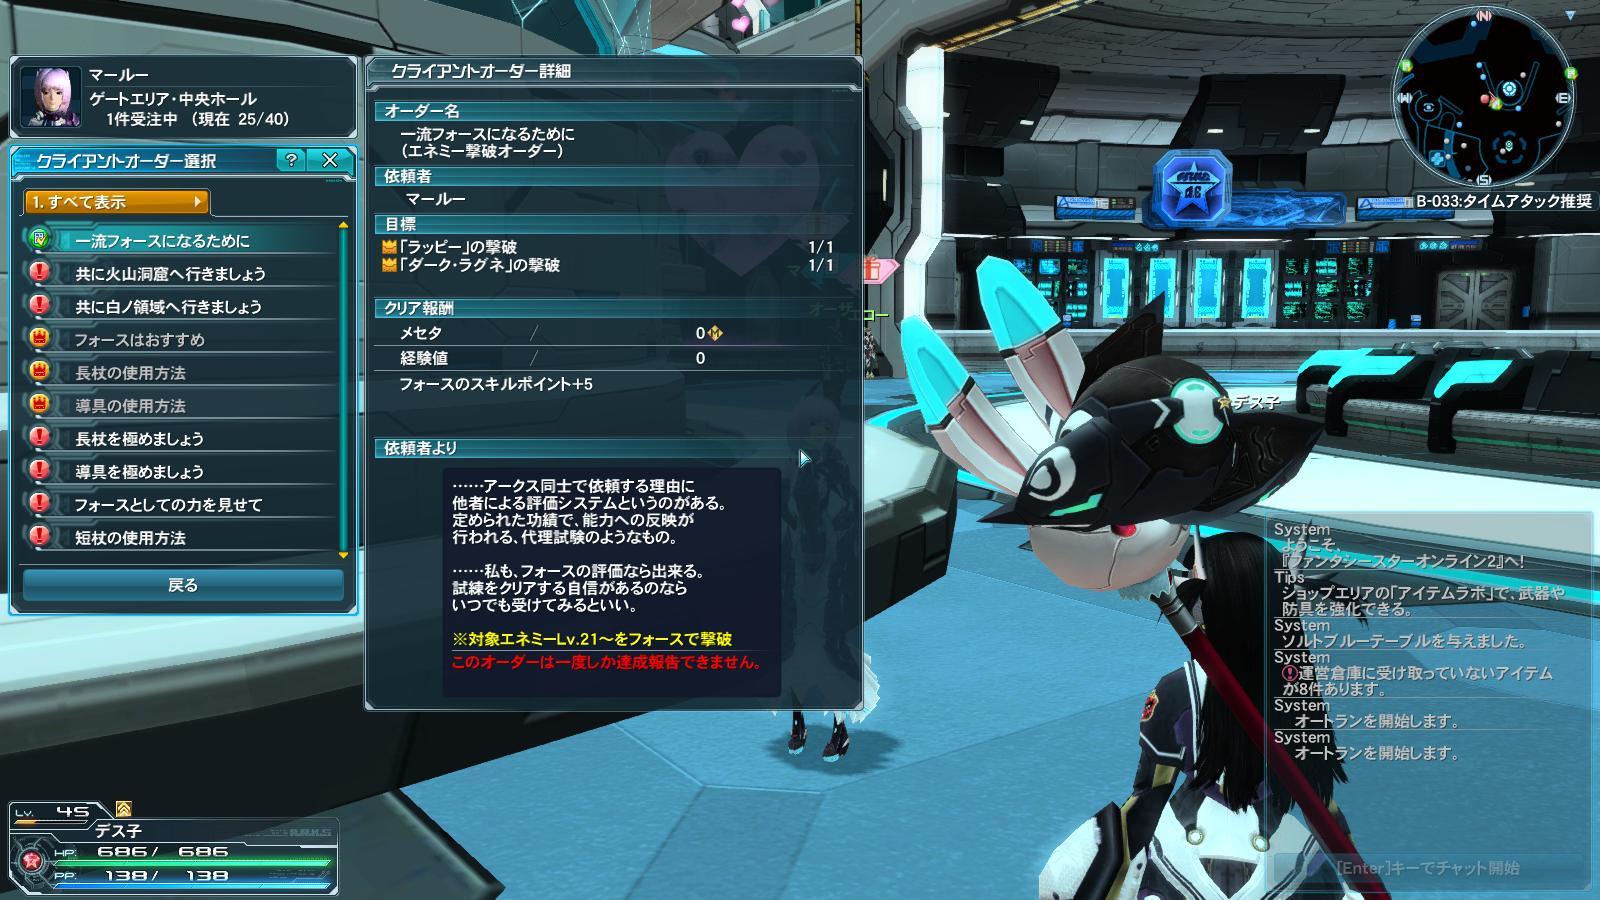 default(2015-02-21)39973.jpg